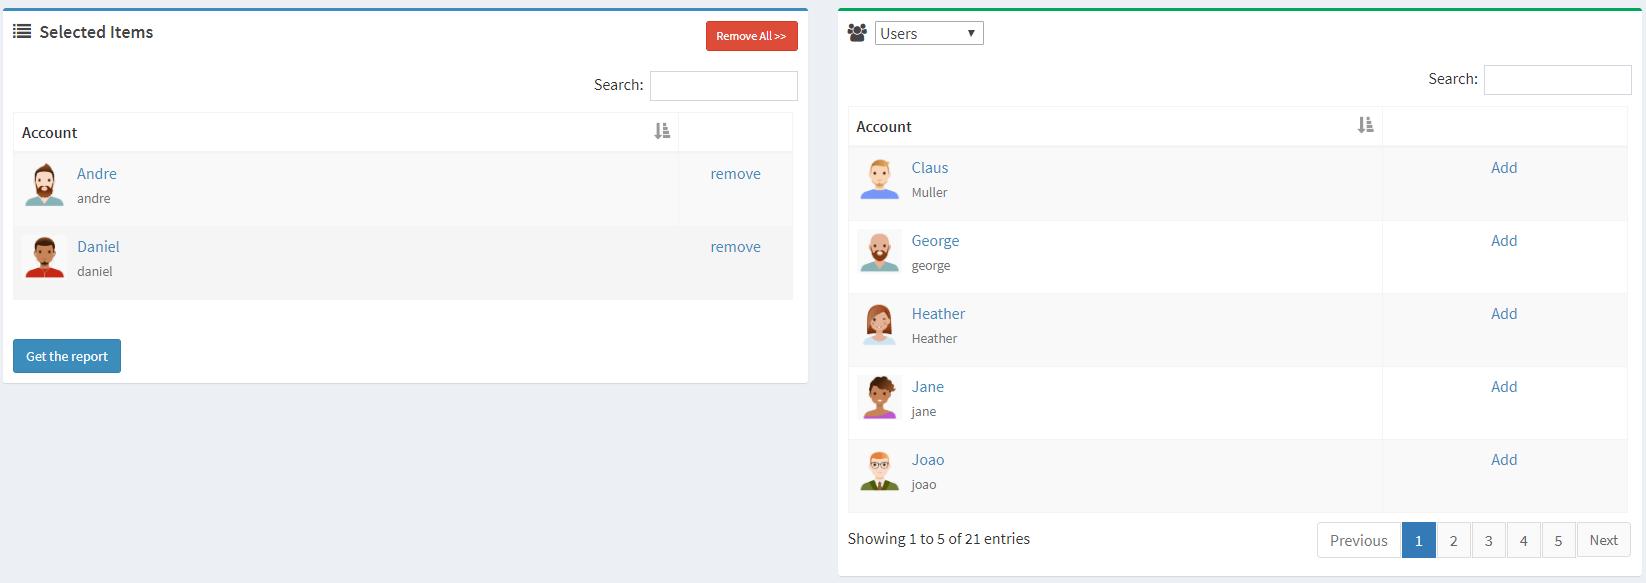 server-based chat history